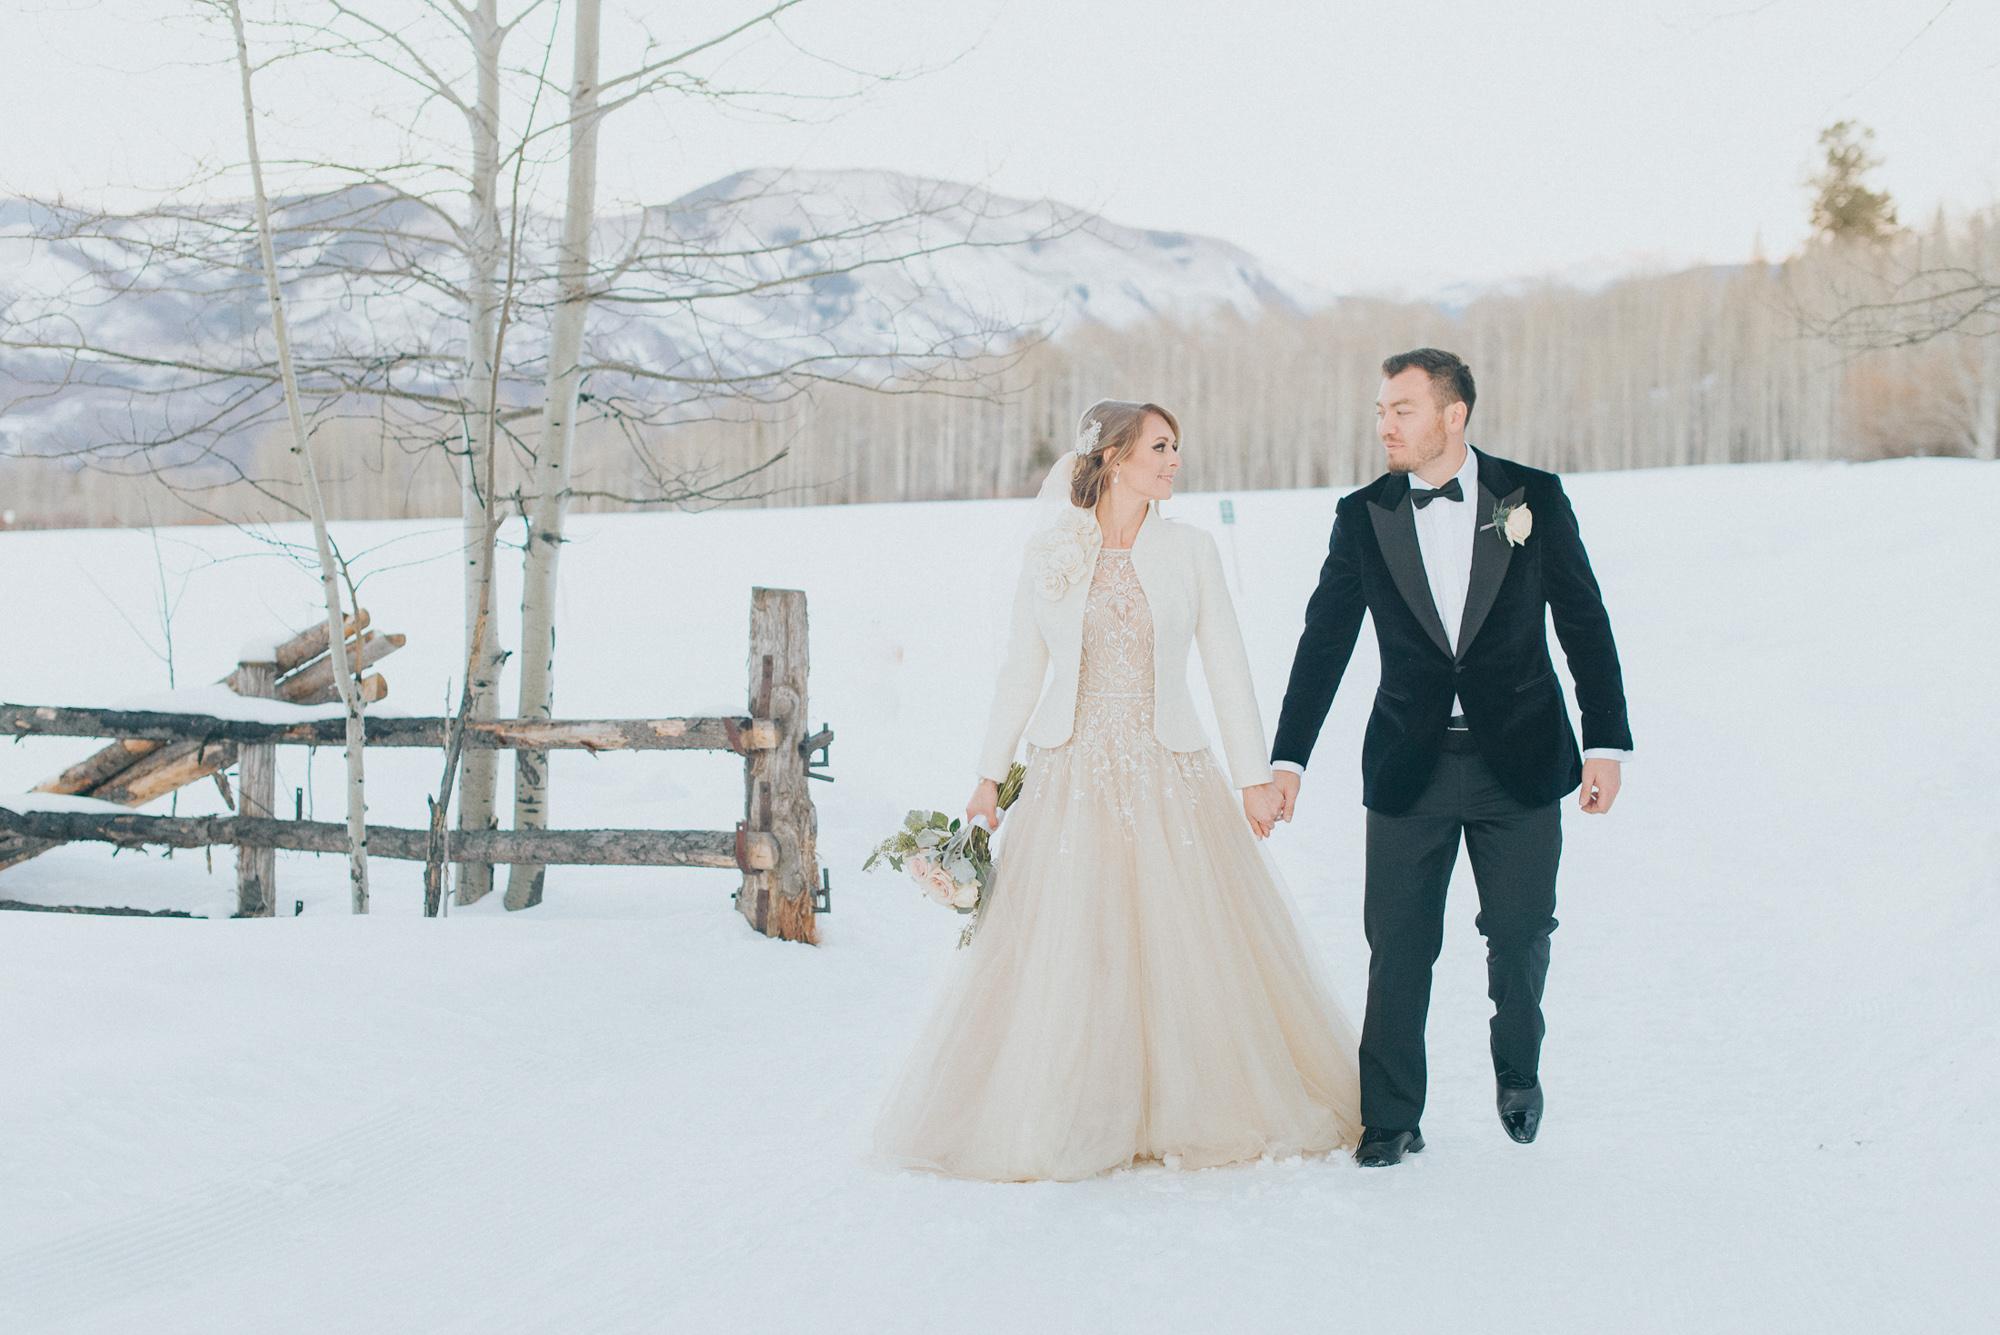 winter mountain wedding blush dress flowers snow